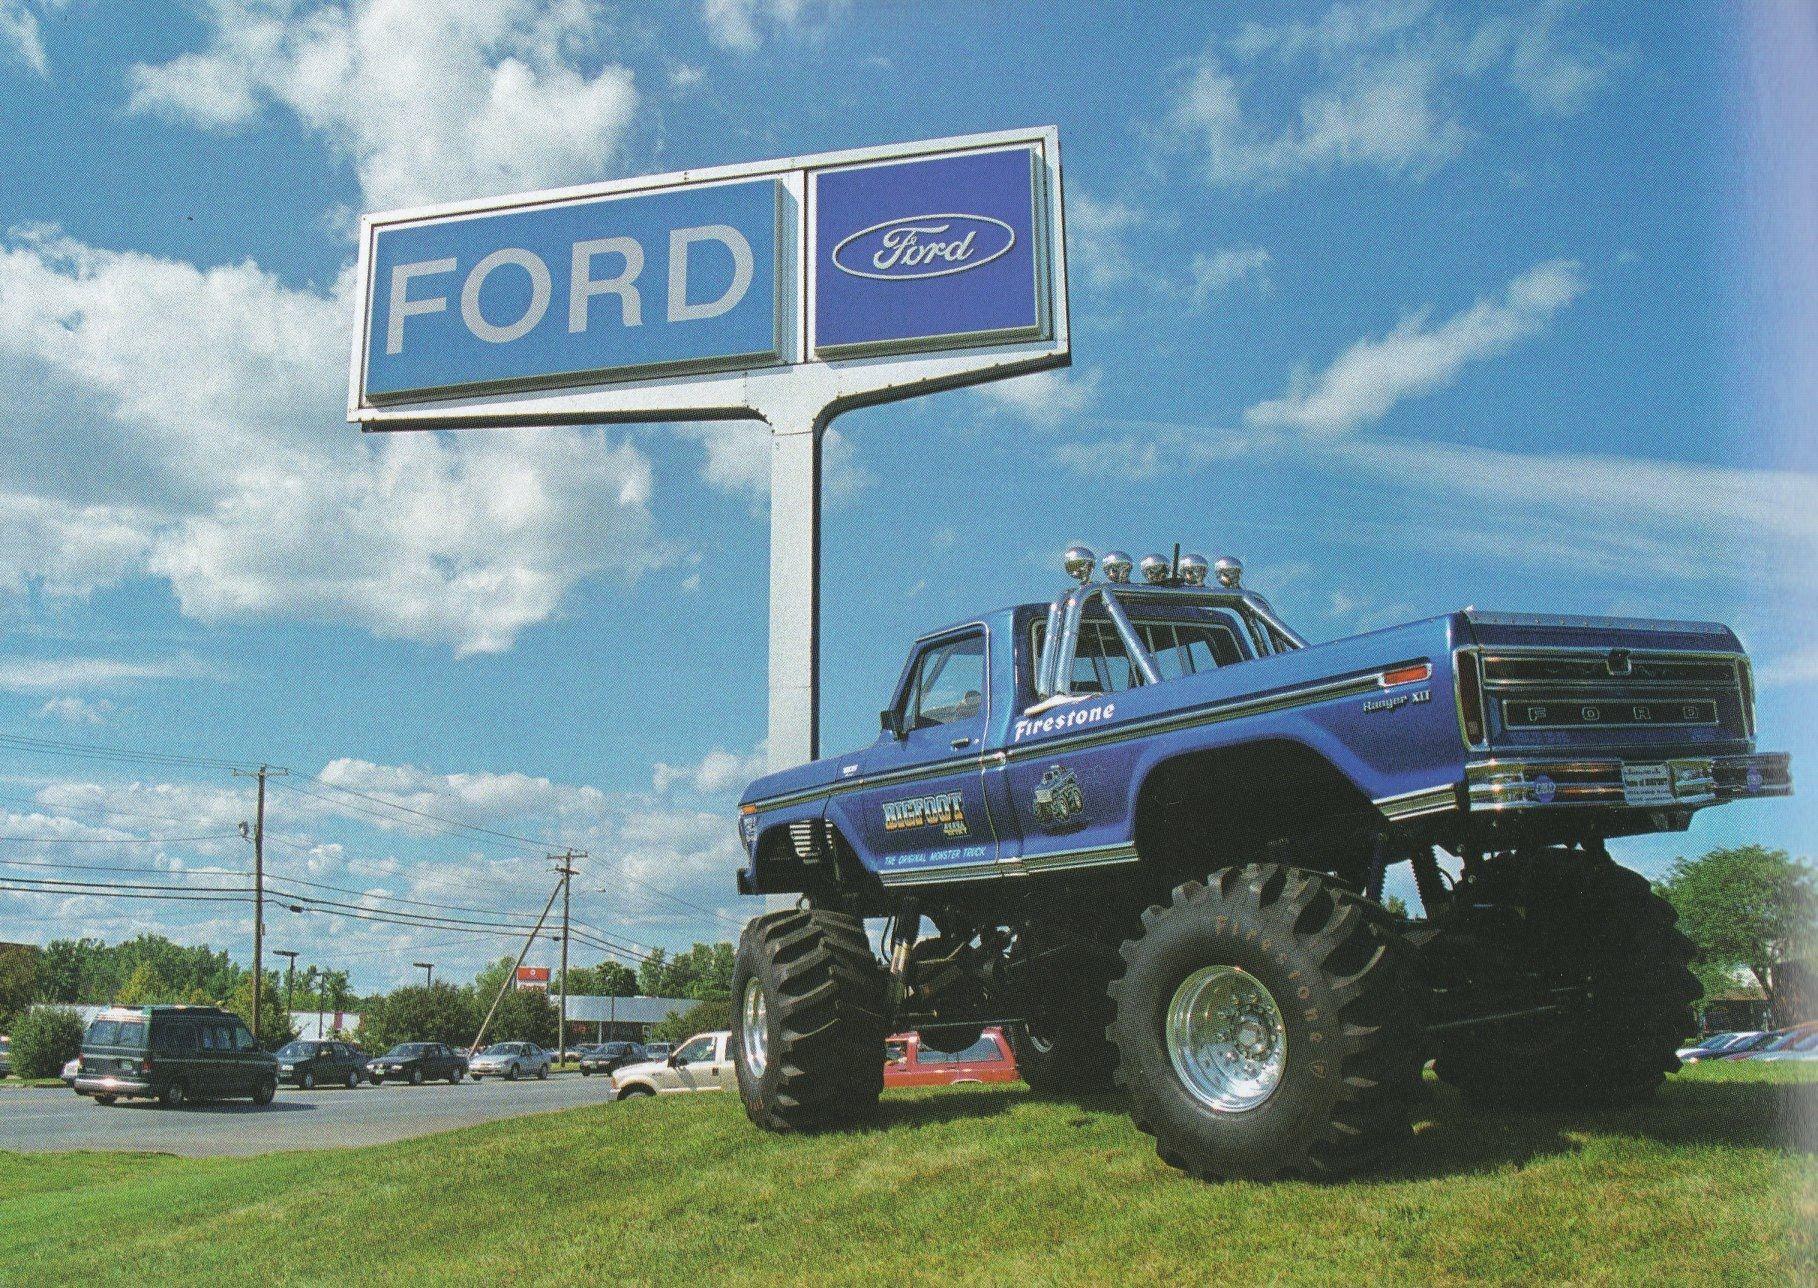 BIGFOOT I Visits A Local Ford Dealership BIGFOOT XX - Nearest ford dealership